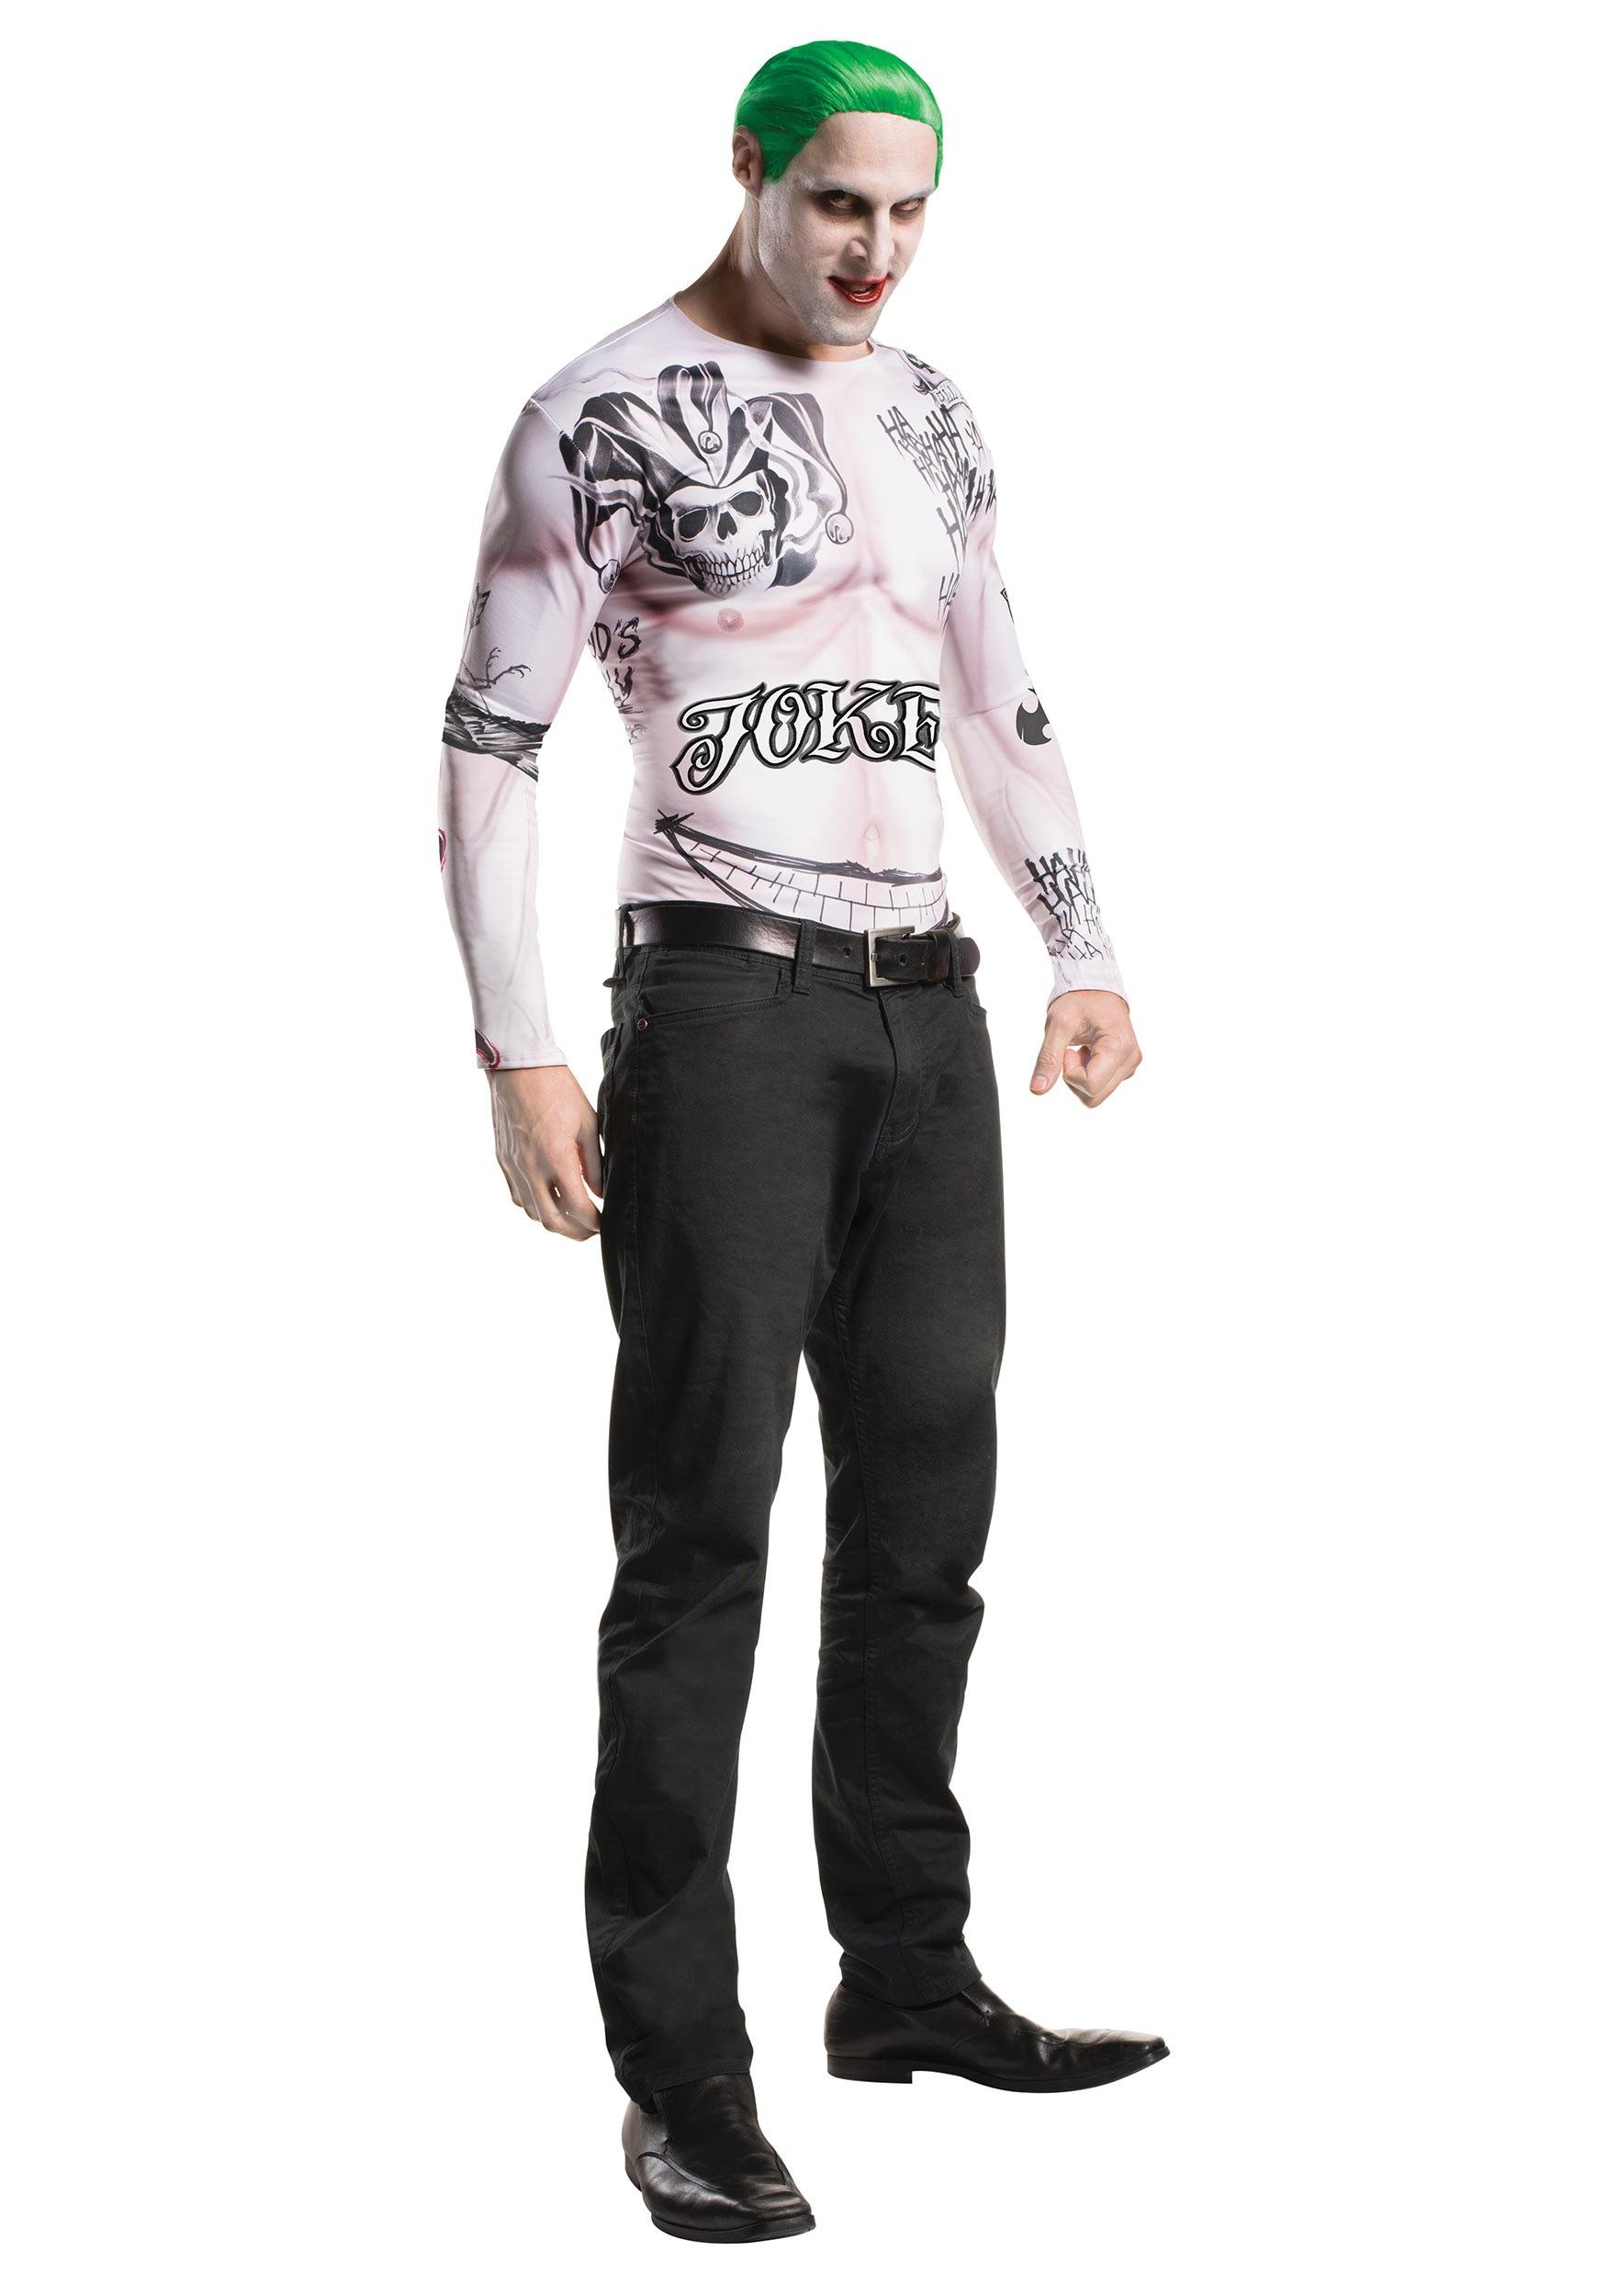 3255c7209 Suicide Squad Joker Costume Kit